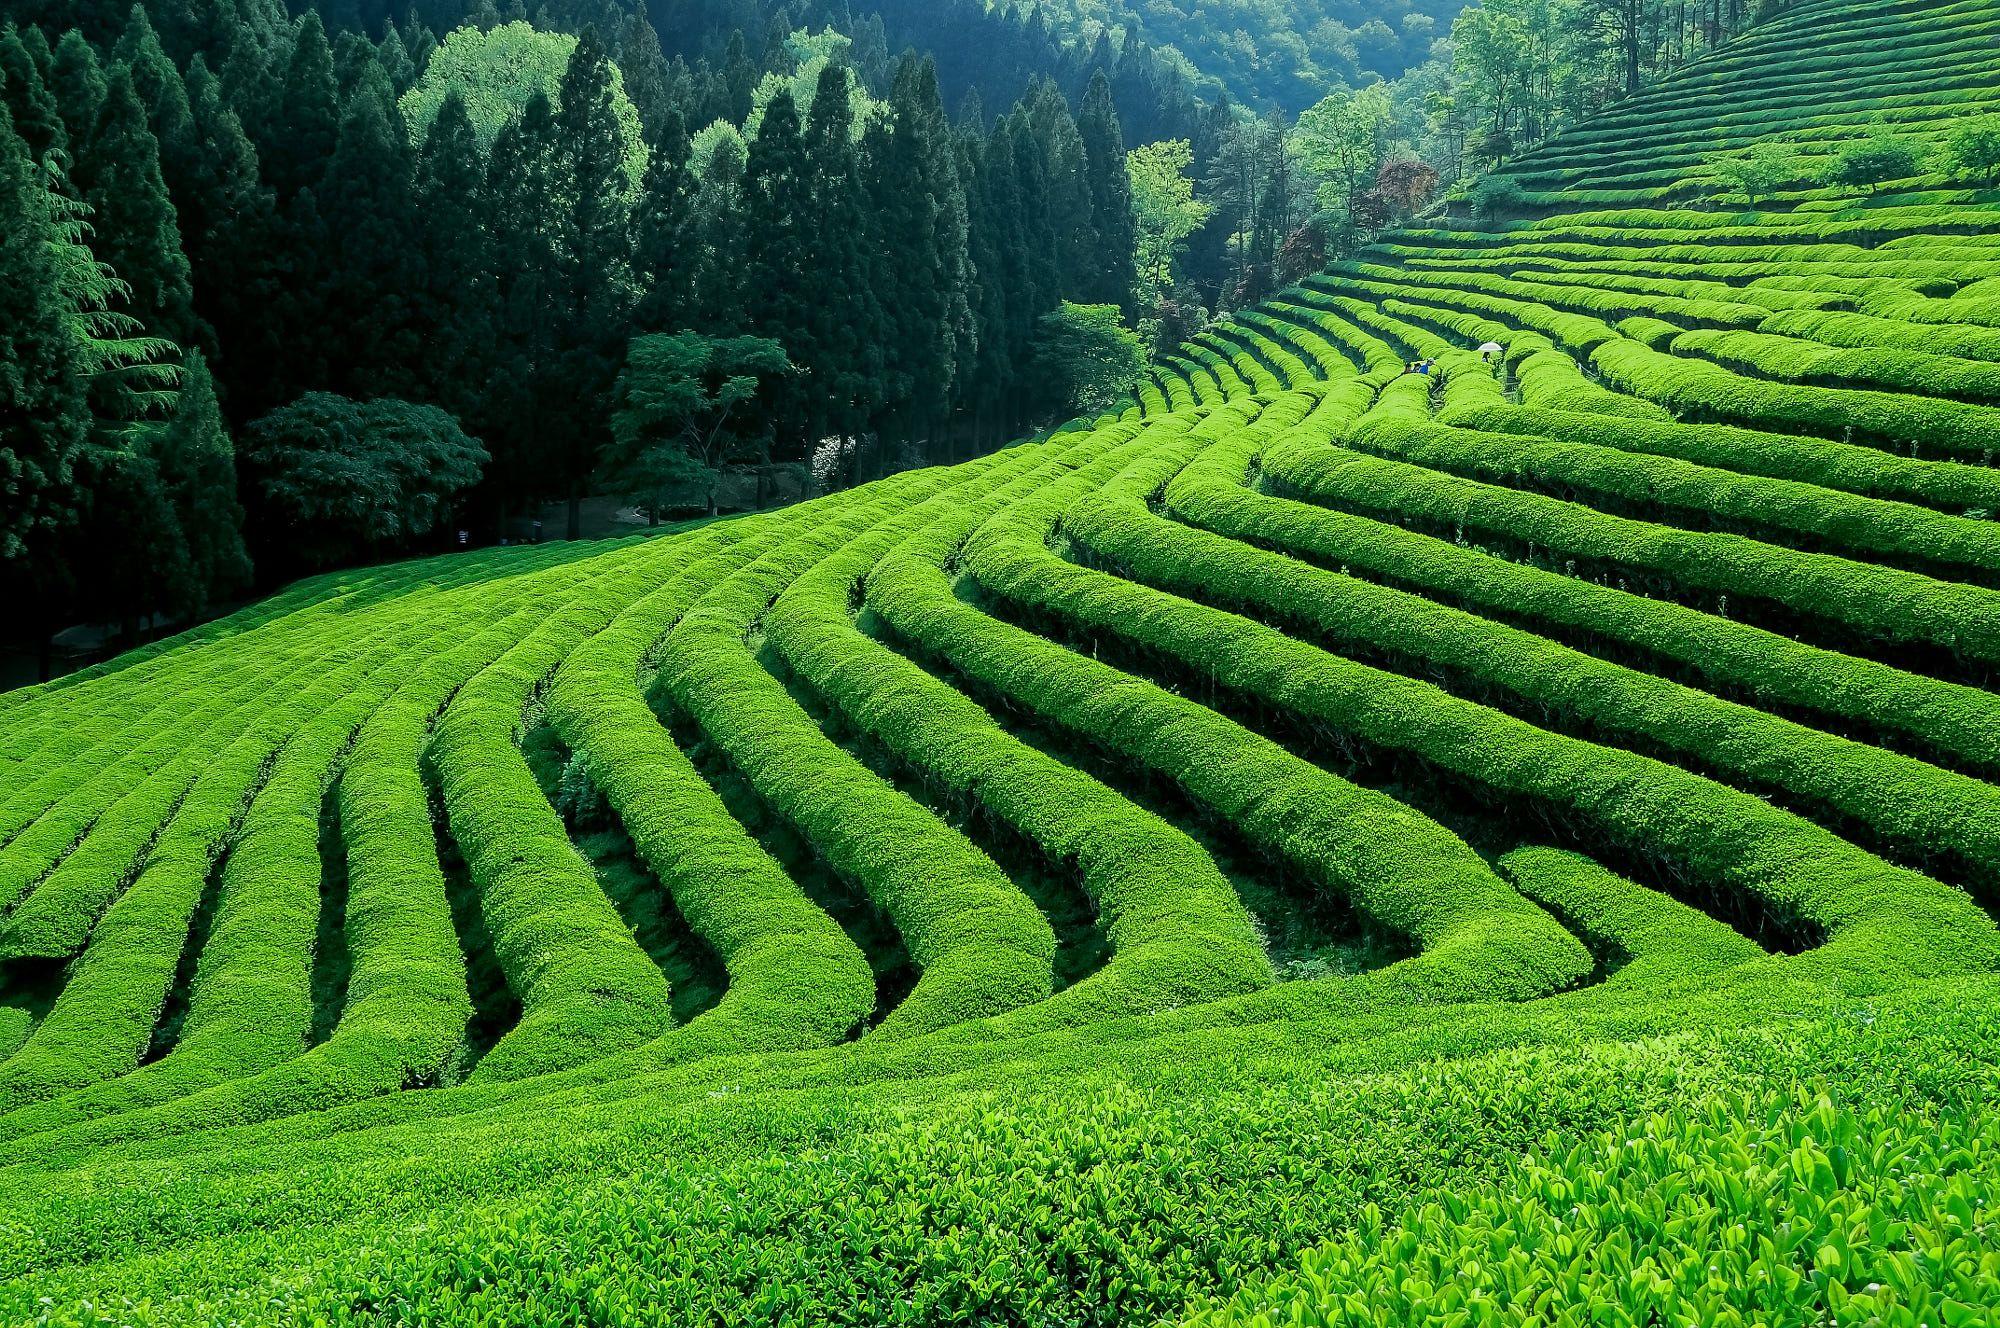 """Green Tea Farm"" by Jeongki Kim 500px 201802 • shot on"